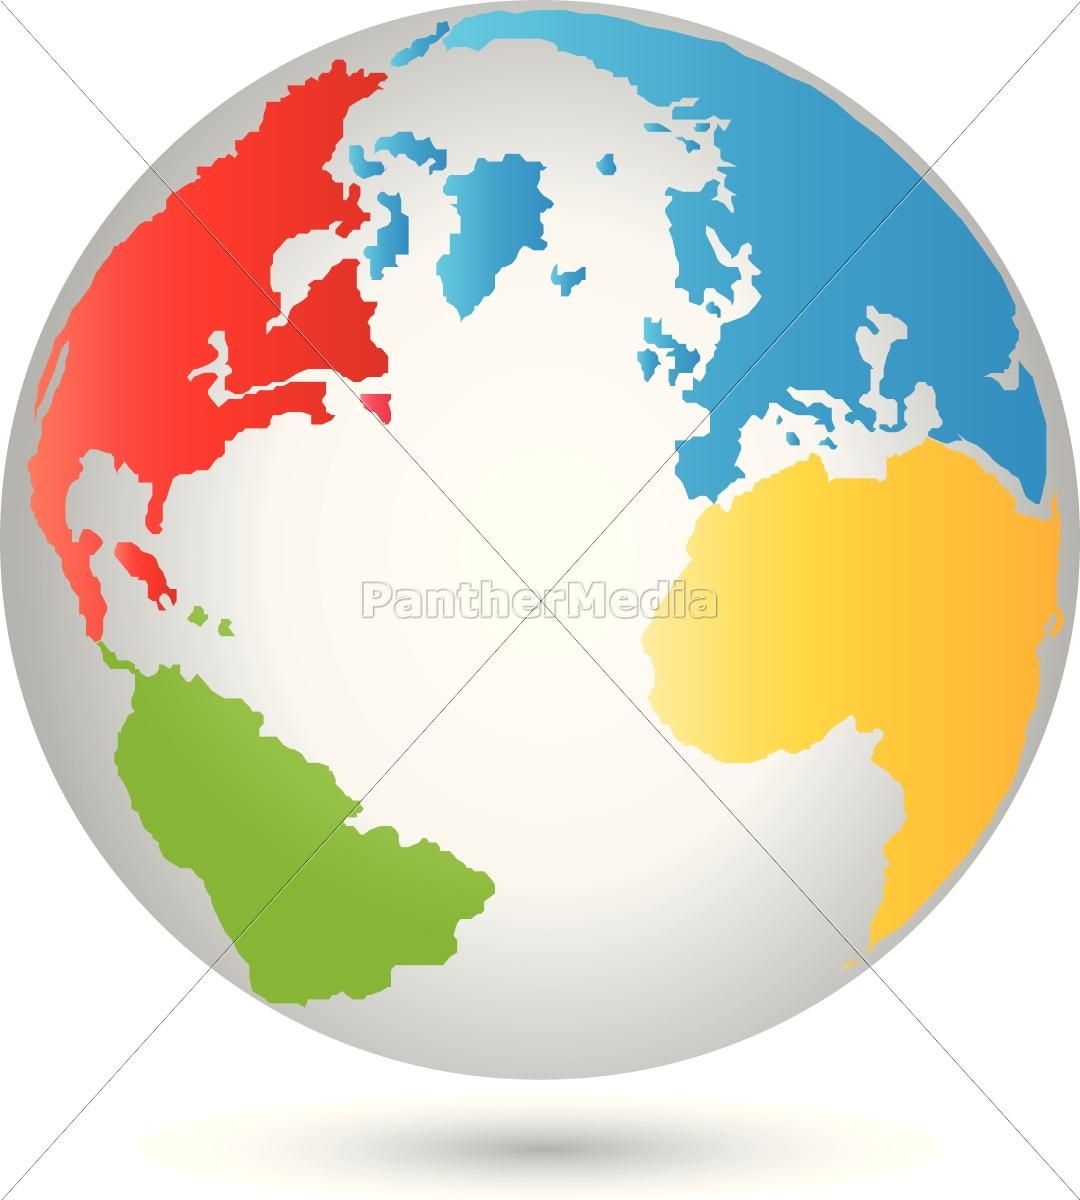 Globus Weltkugel Karte.Lizenzfreie Vektorgrafik 14654741 Erde Globus Weltkugel Vektor